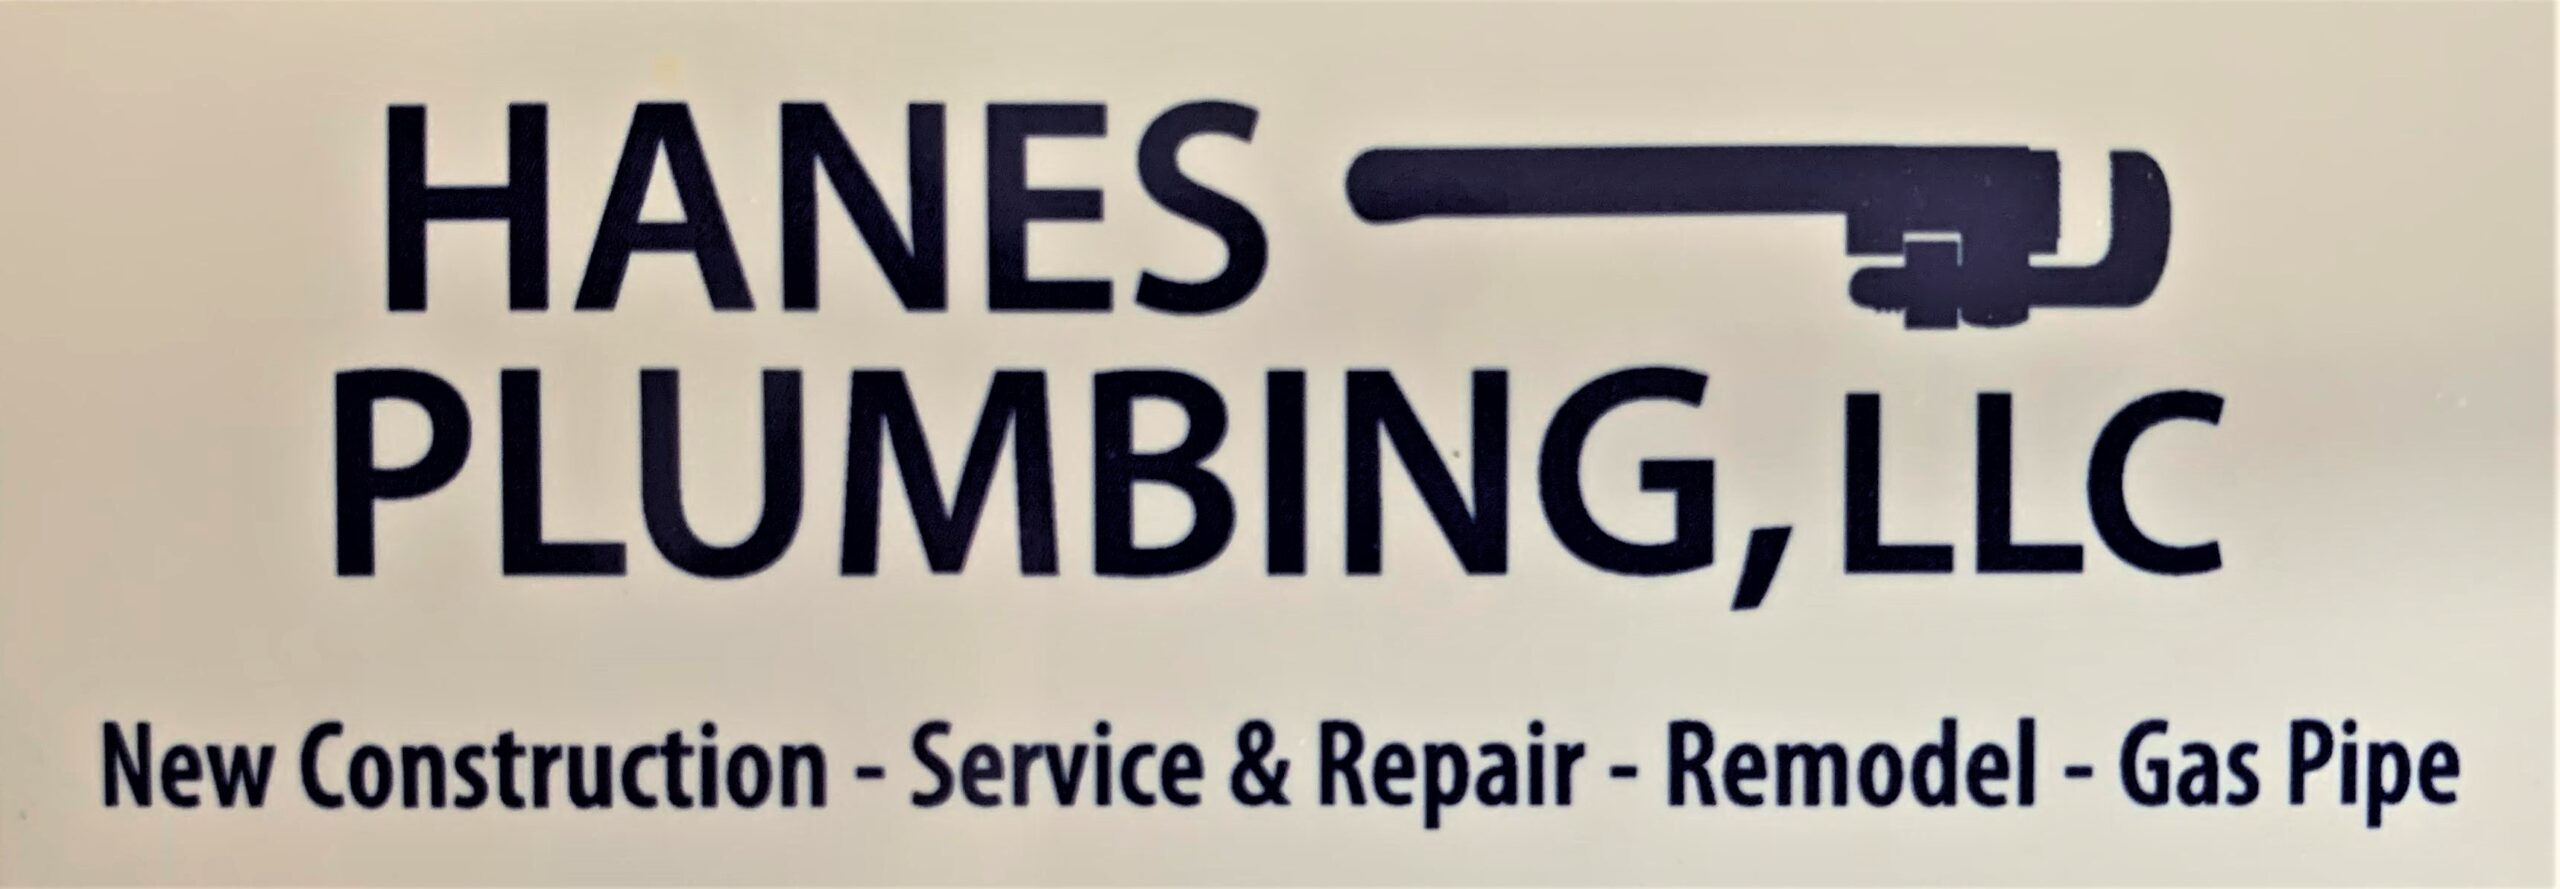 Hanes Plumbing, LLC